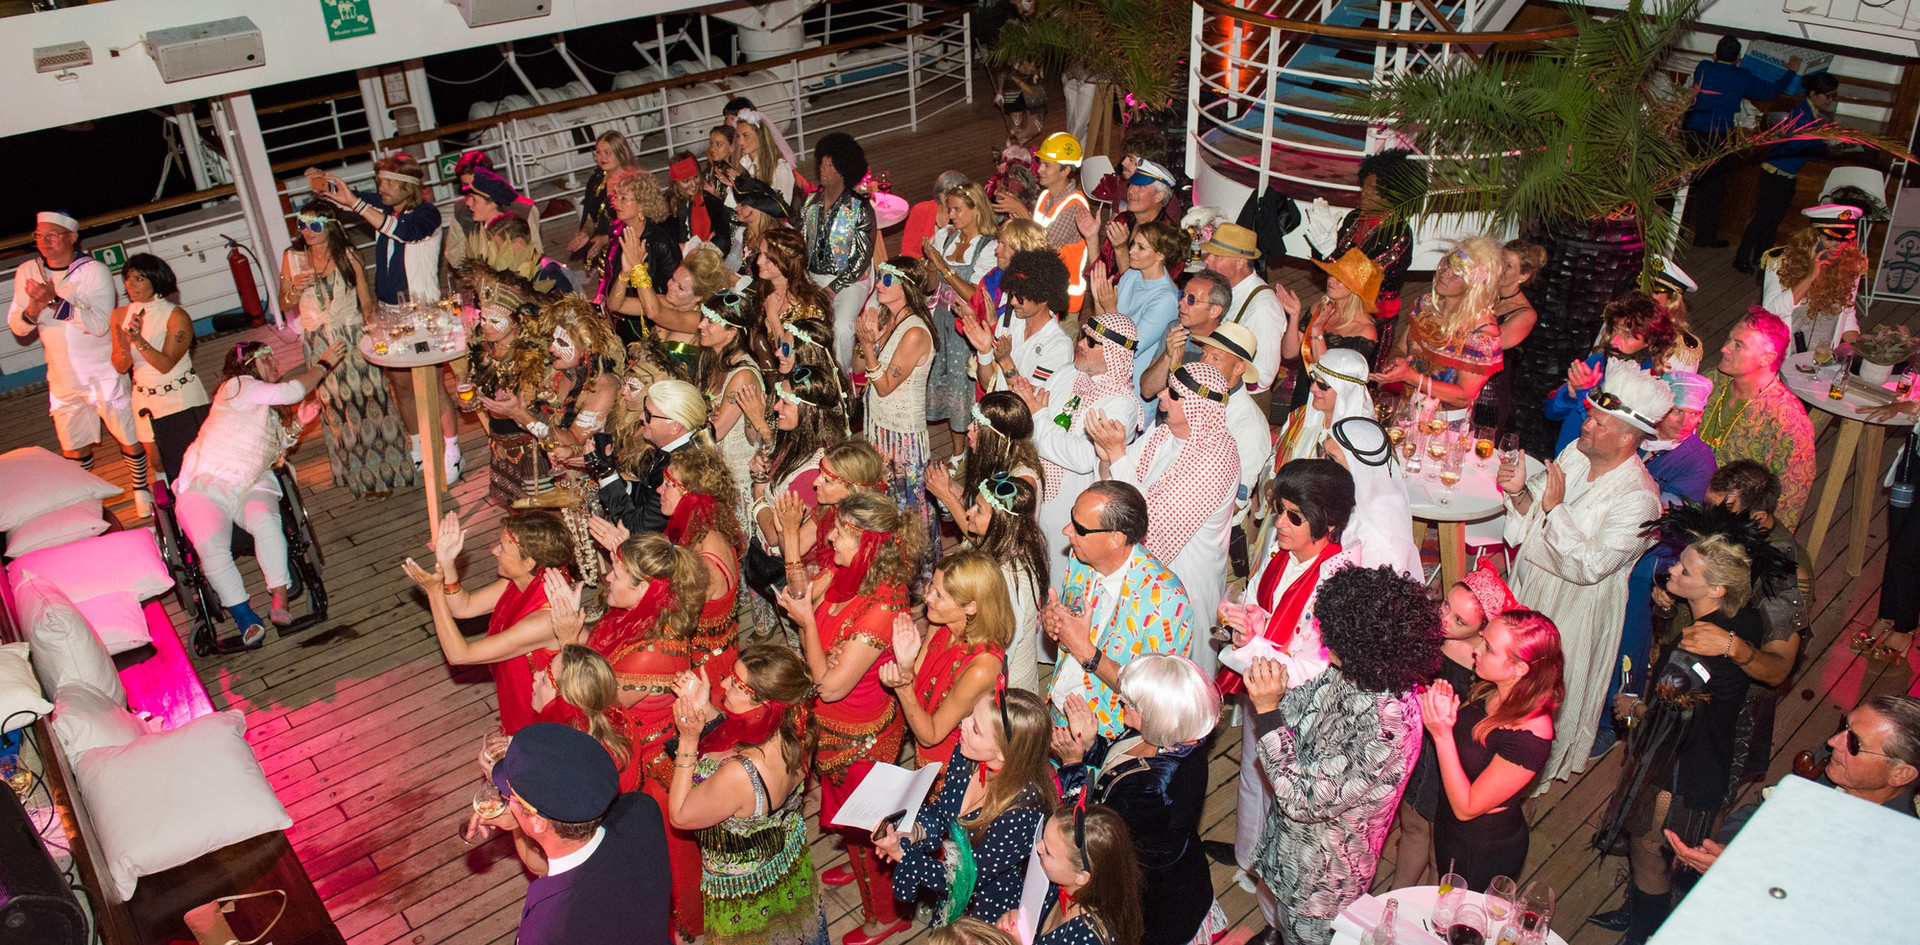 feest-organiseren-cruise-publiek.jpg